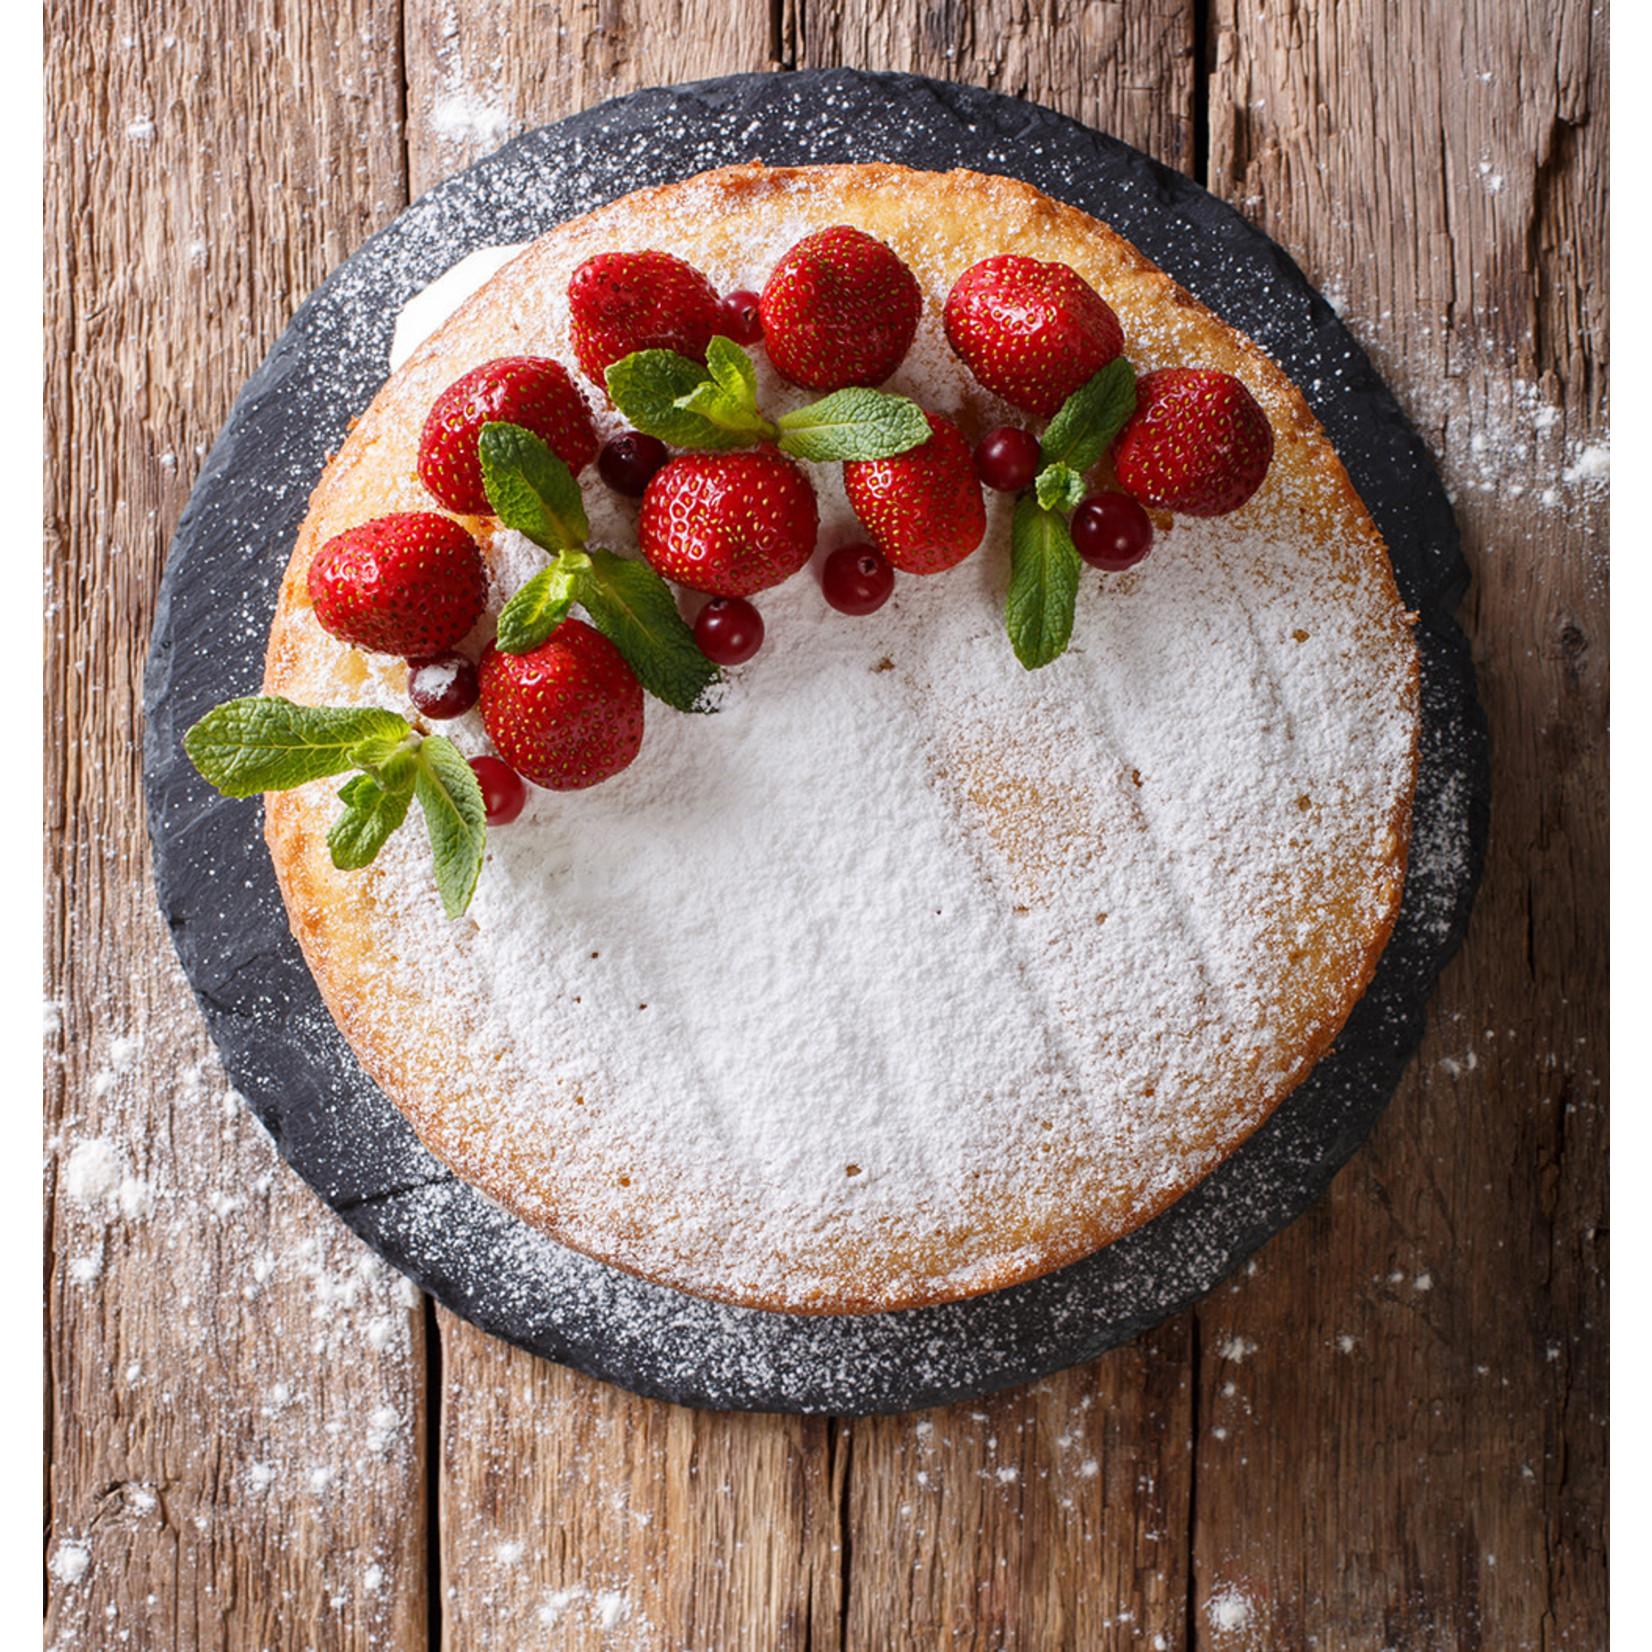 Pastry Depot Intro to Cake: Cake Types & Methods -